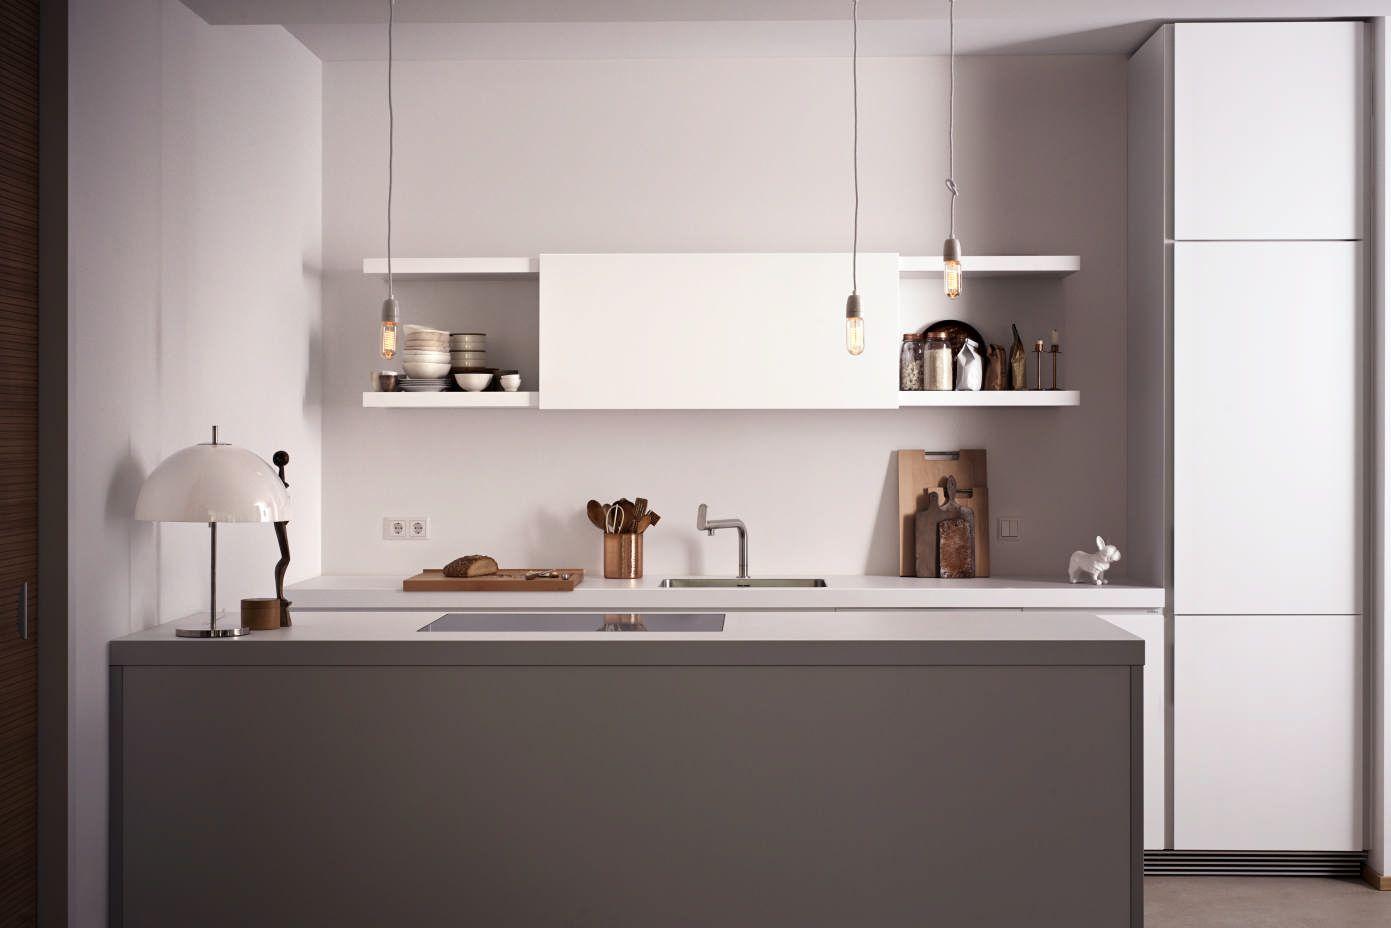 Design Cube Keuken : Bulthaup b keuken wit hangkasten keukeneiland decoratie